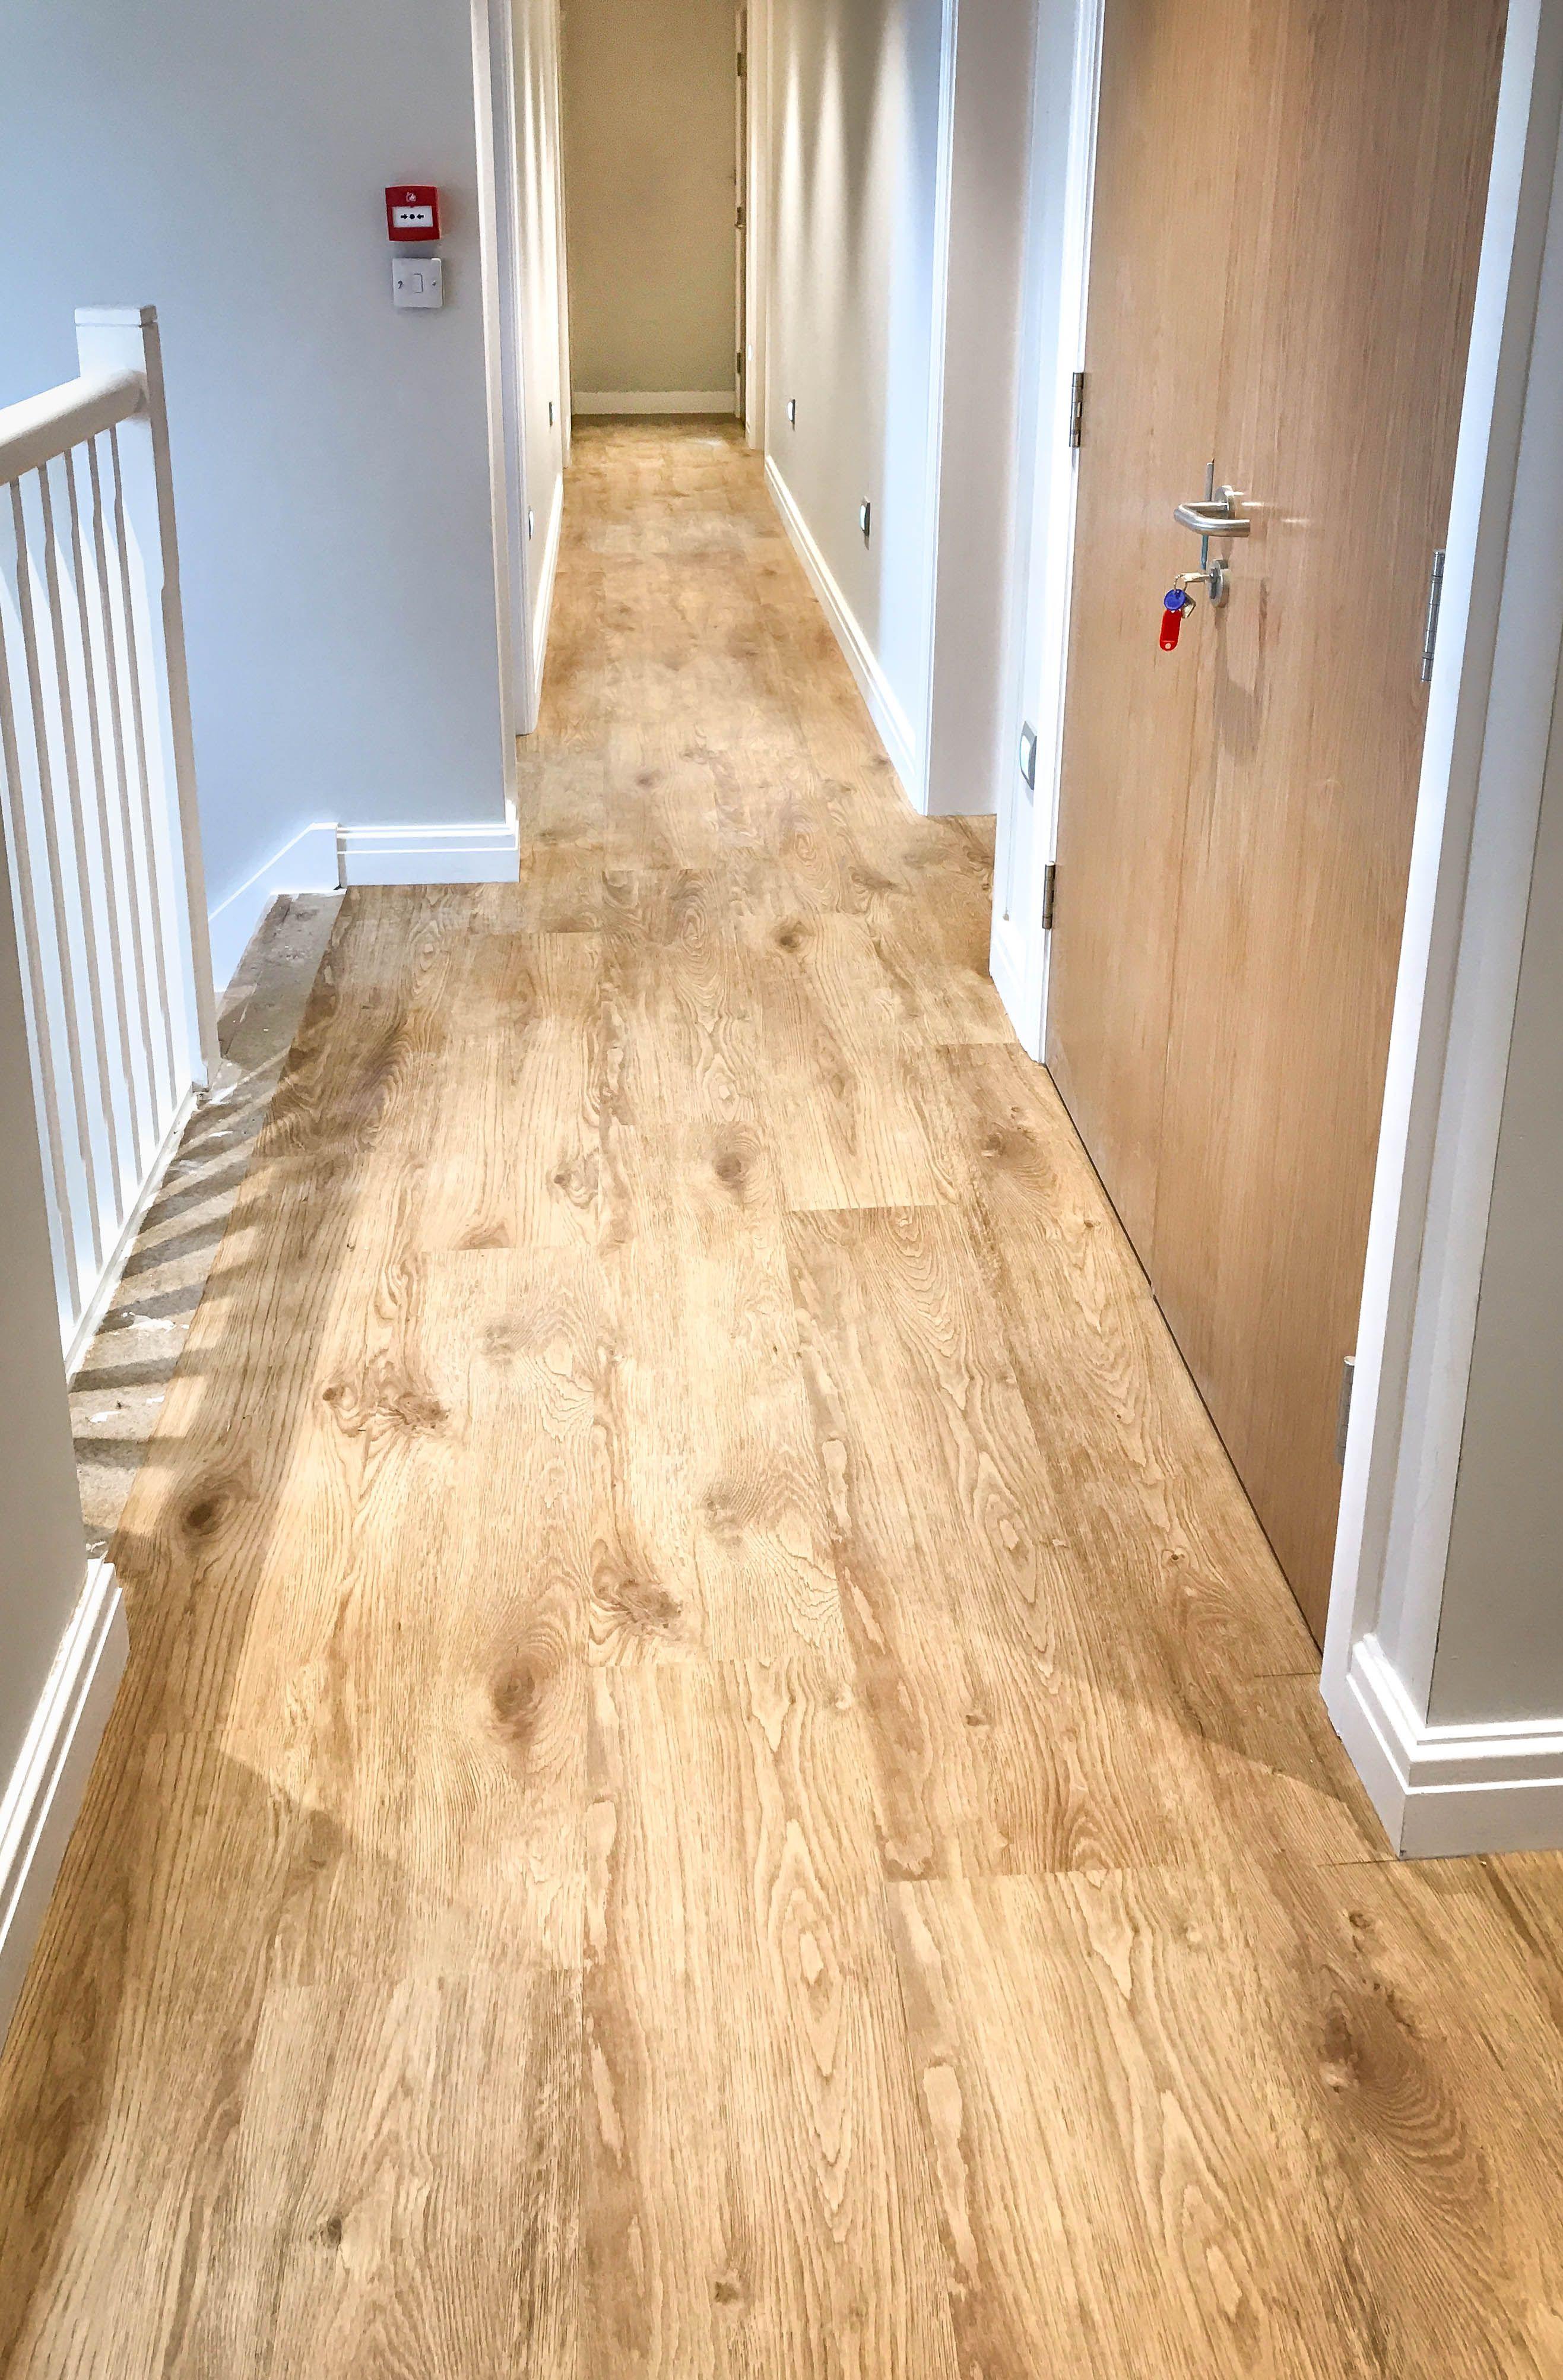 hall mawson floors floor with karndean a border flooring keyline